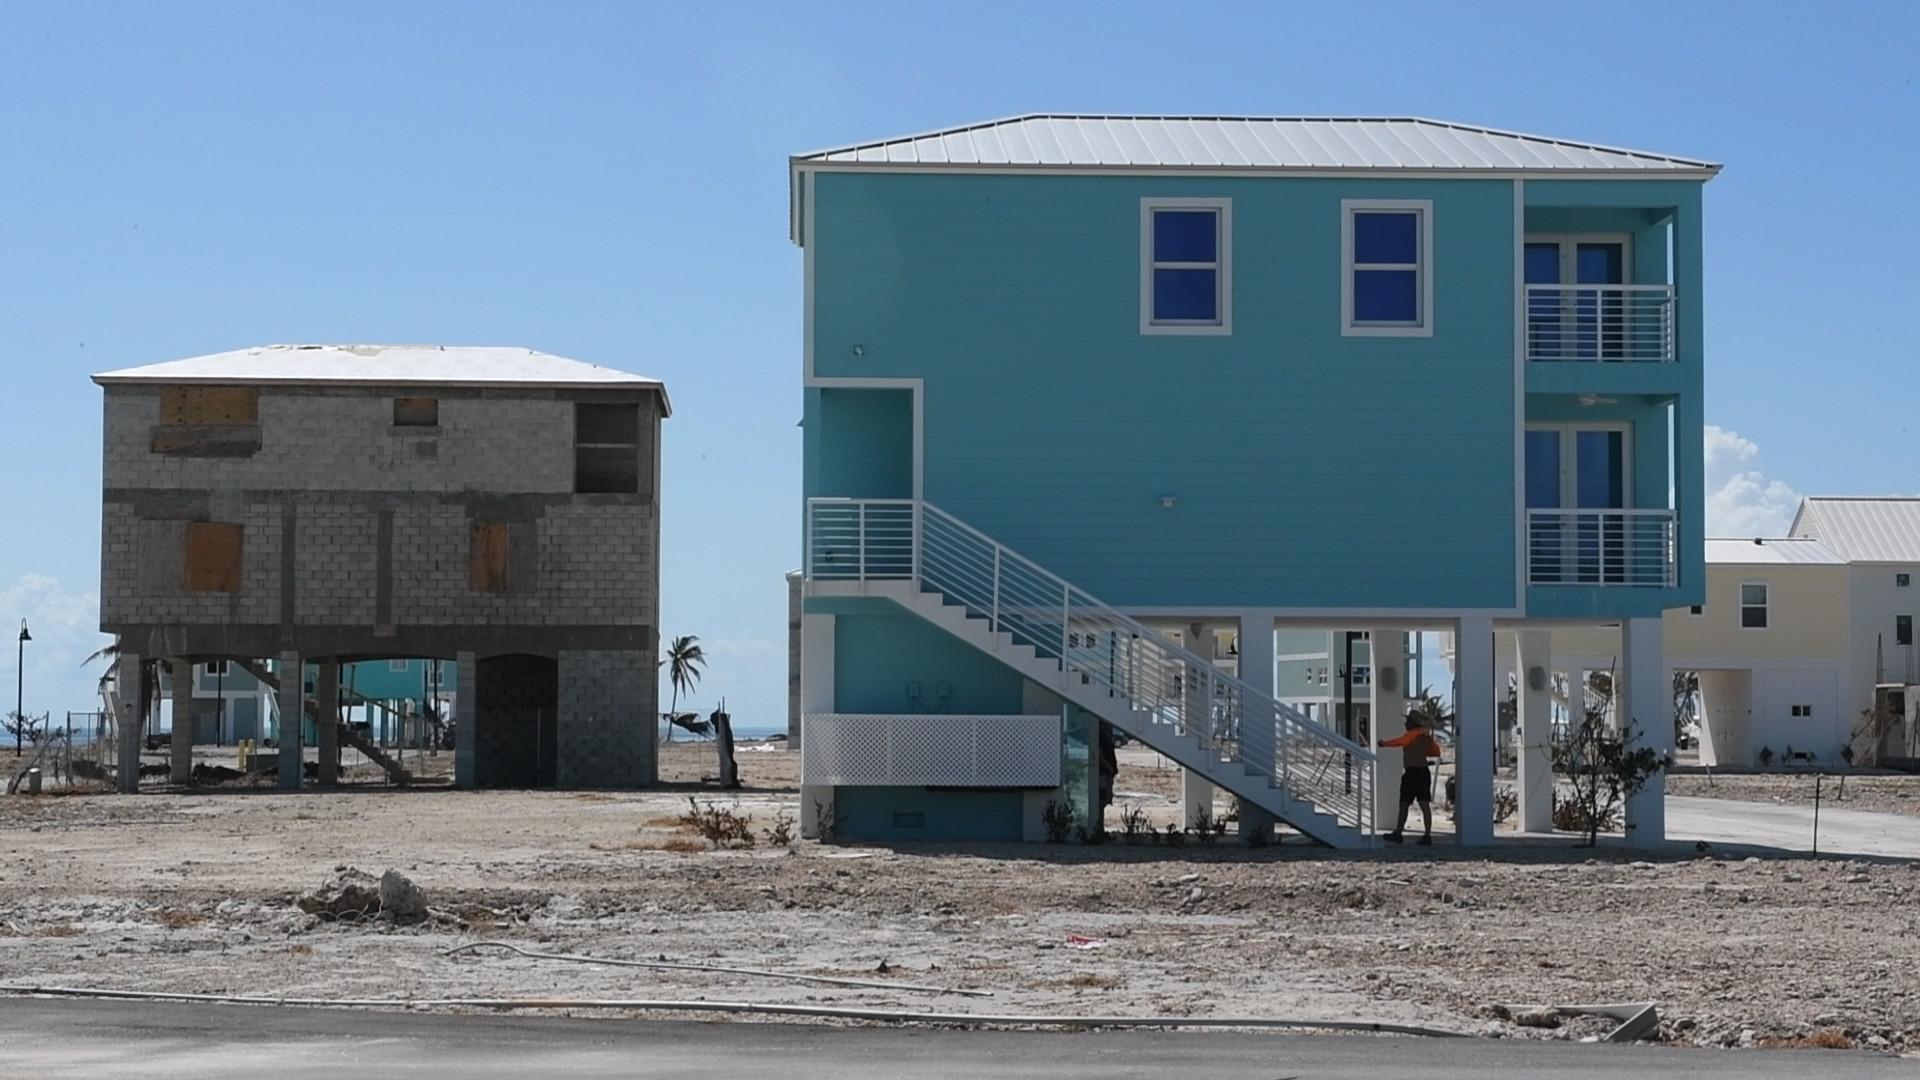 Irma 39 s destruction of trailers challenges keys 39 lifestyle for Concrete homes florida